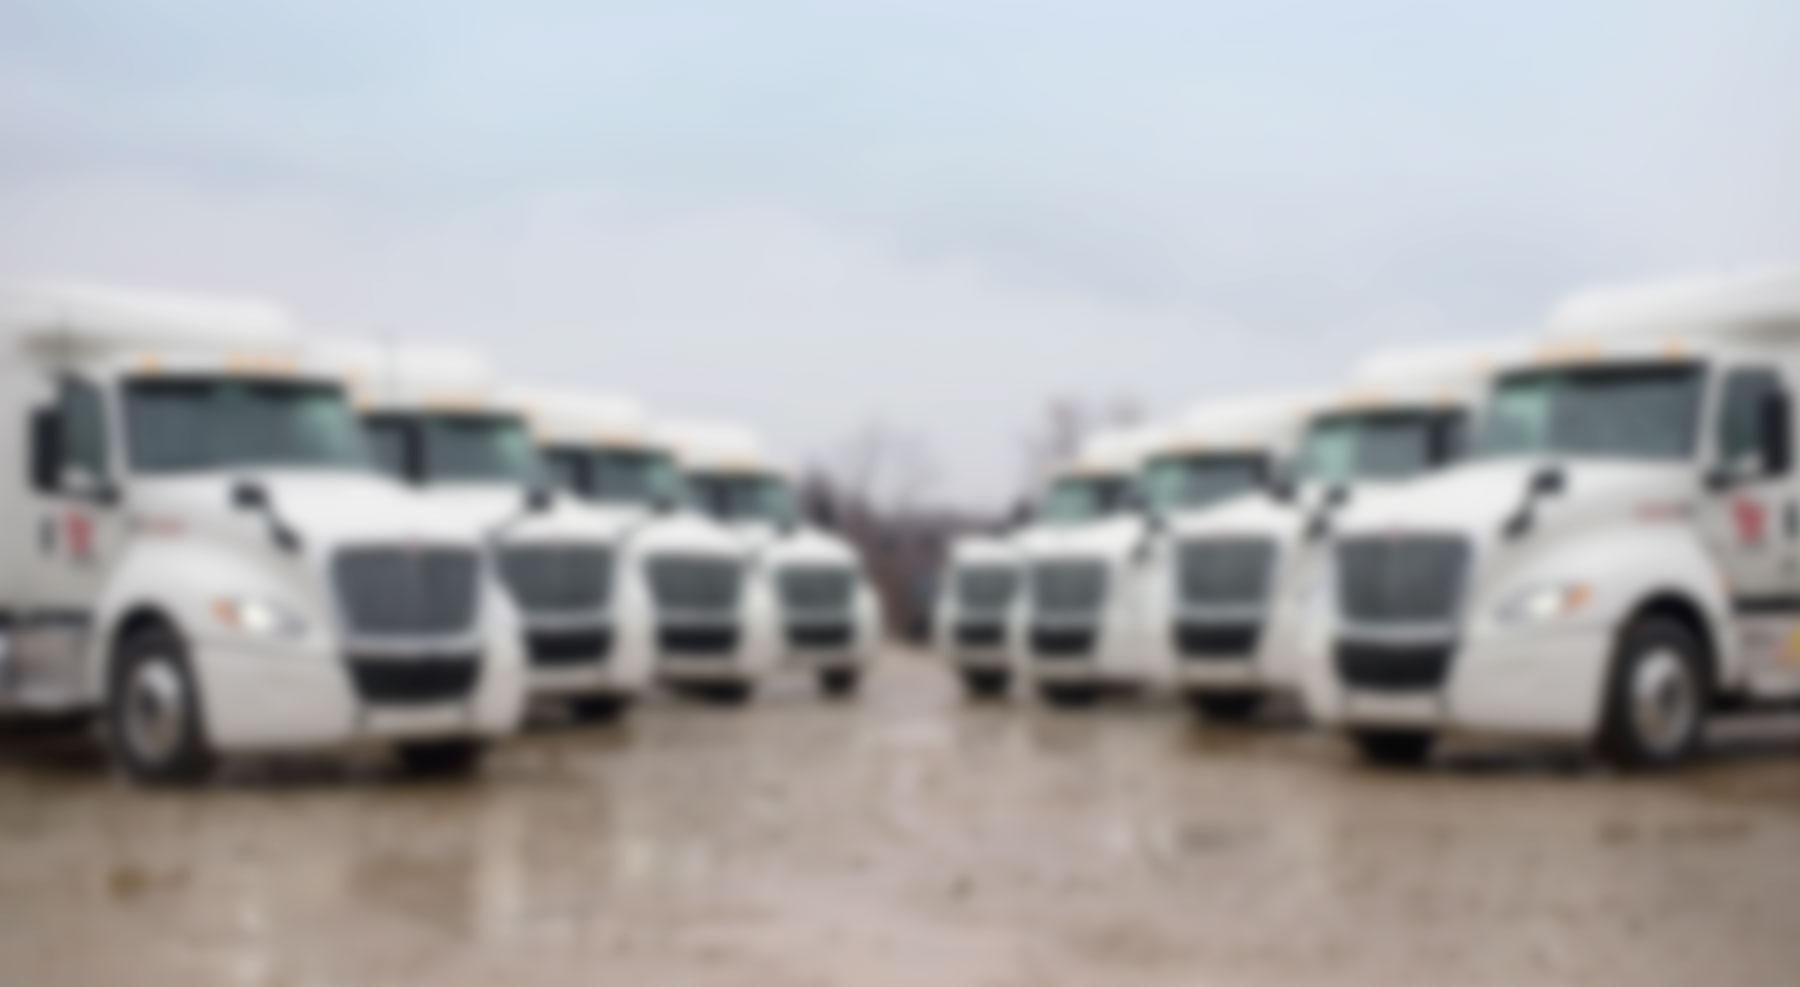 https://www.crlease.com/sites/default/files/revslider/image/blurry-trucks.jpg